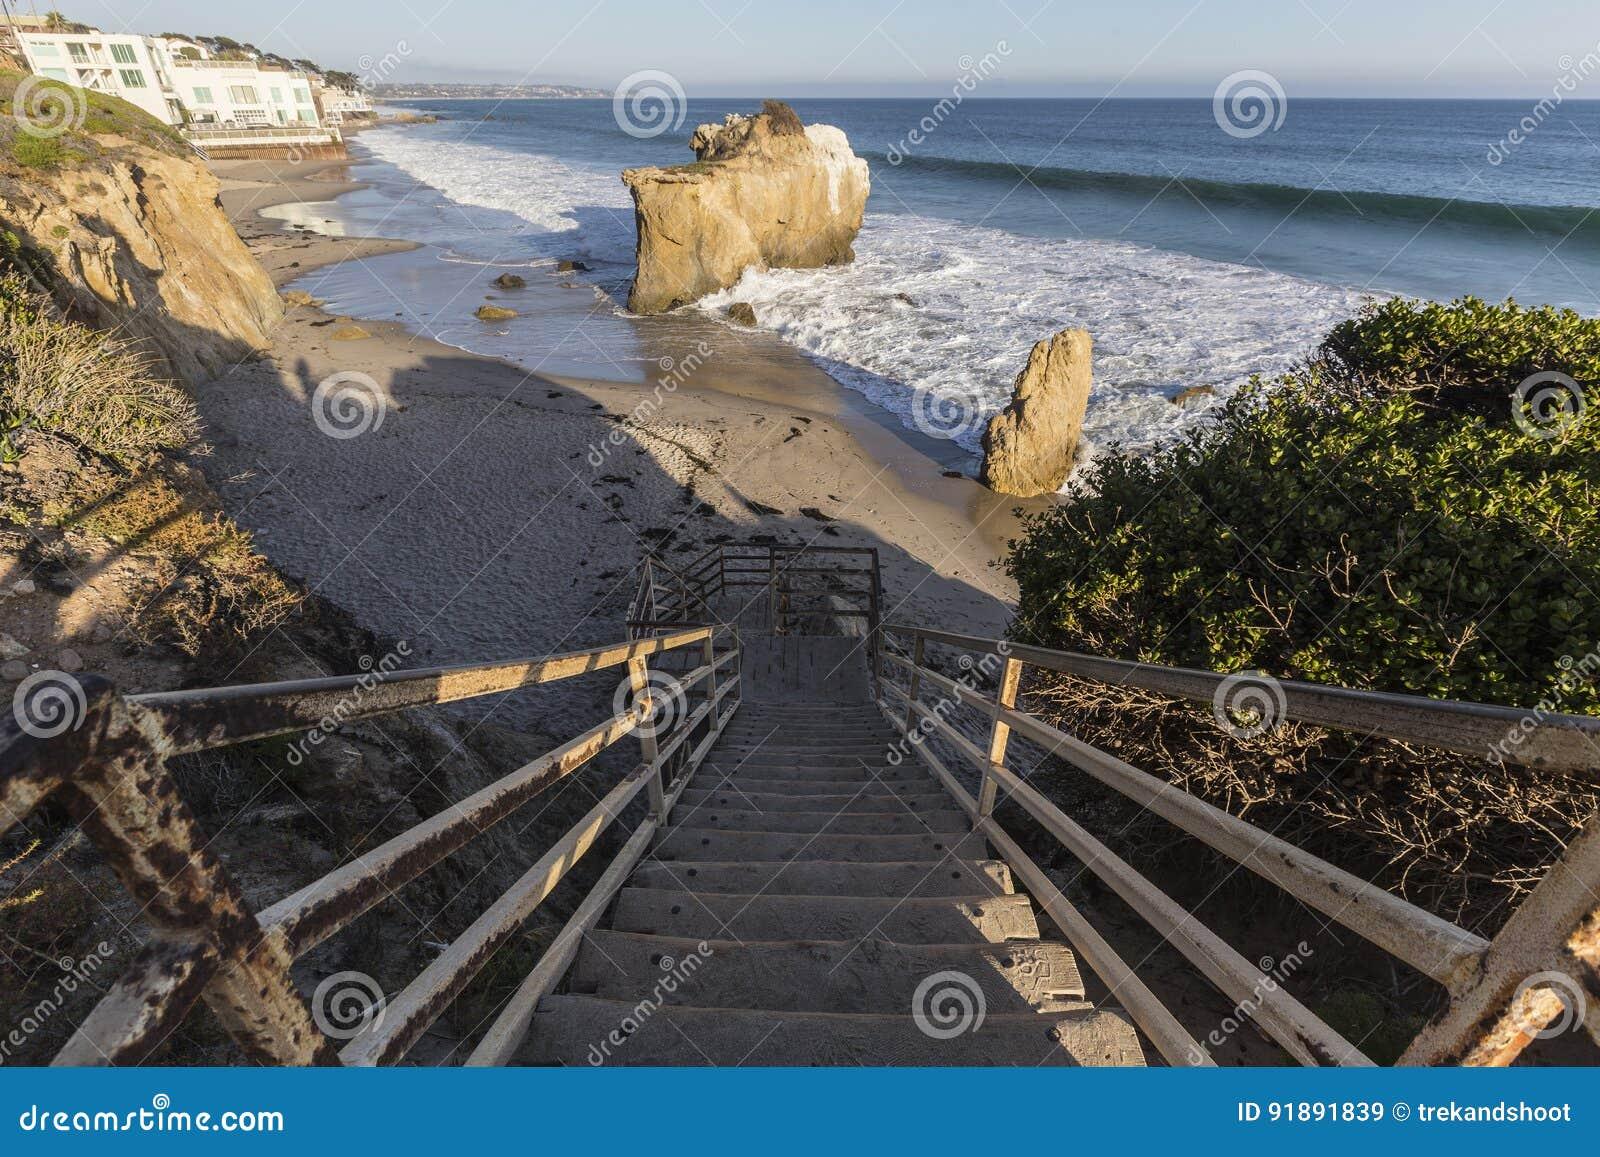 EL Matador State Beach Stairs di Malibu California